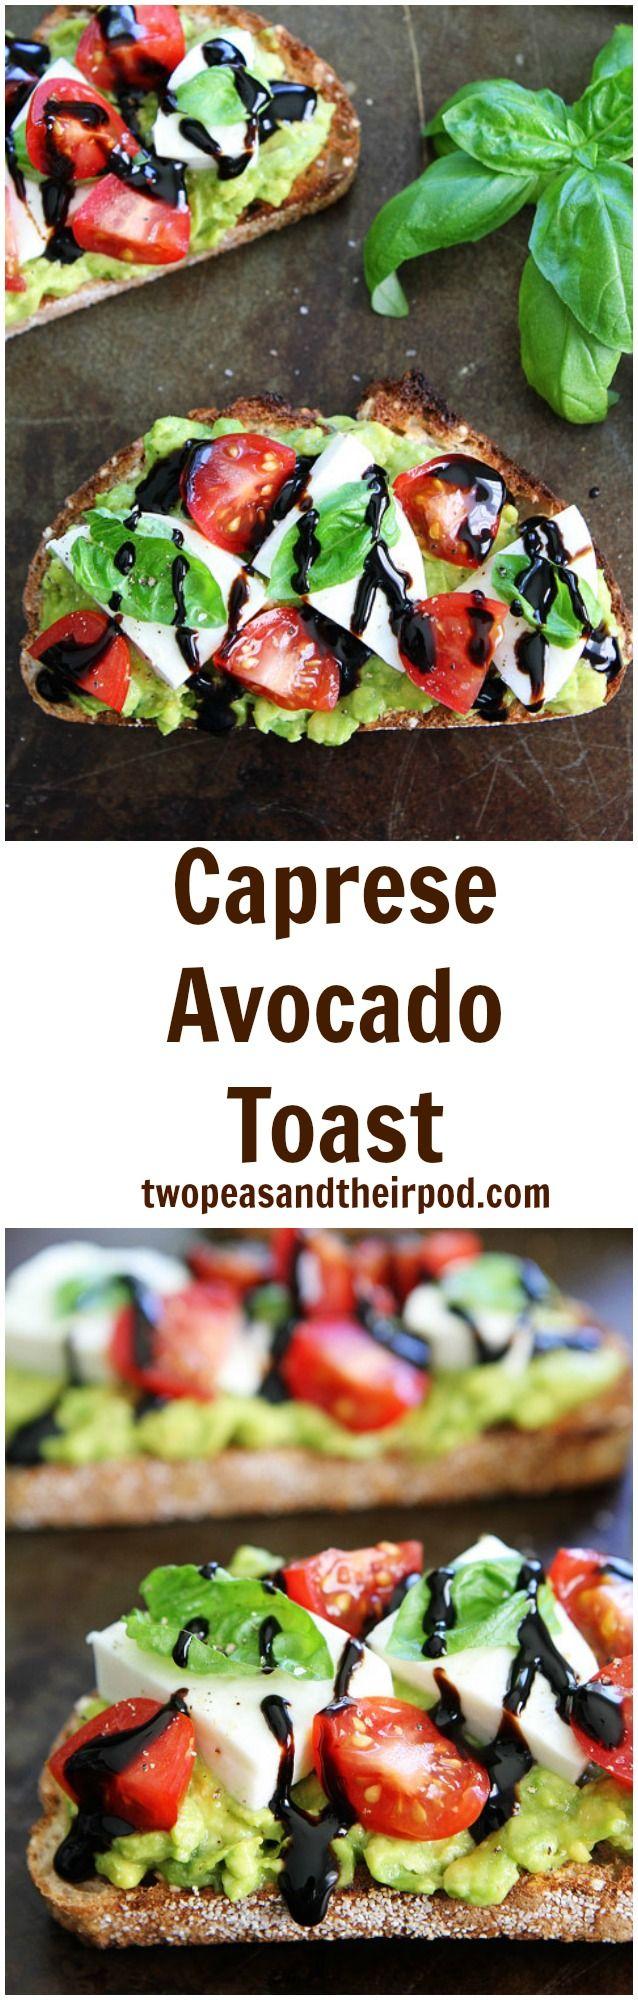 Caprese Avocado Toast Recipe on twopeasandtheirpod.com The BEST avocado toast and it's so easy to make!